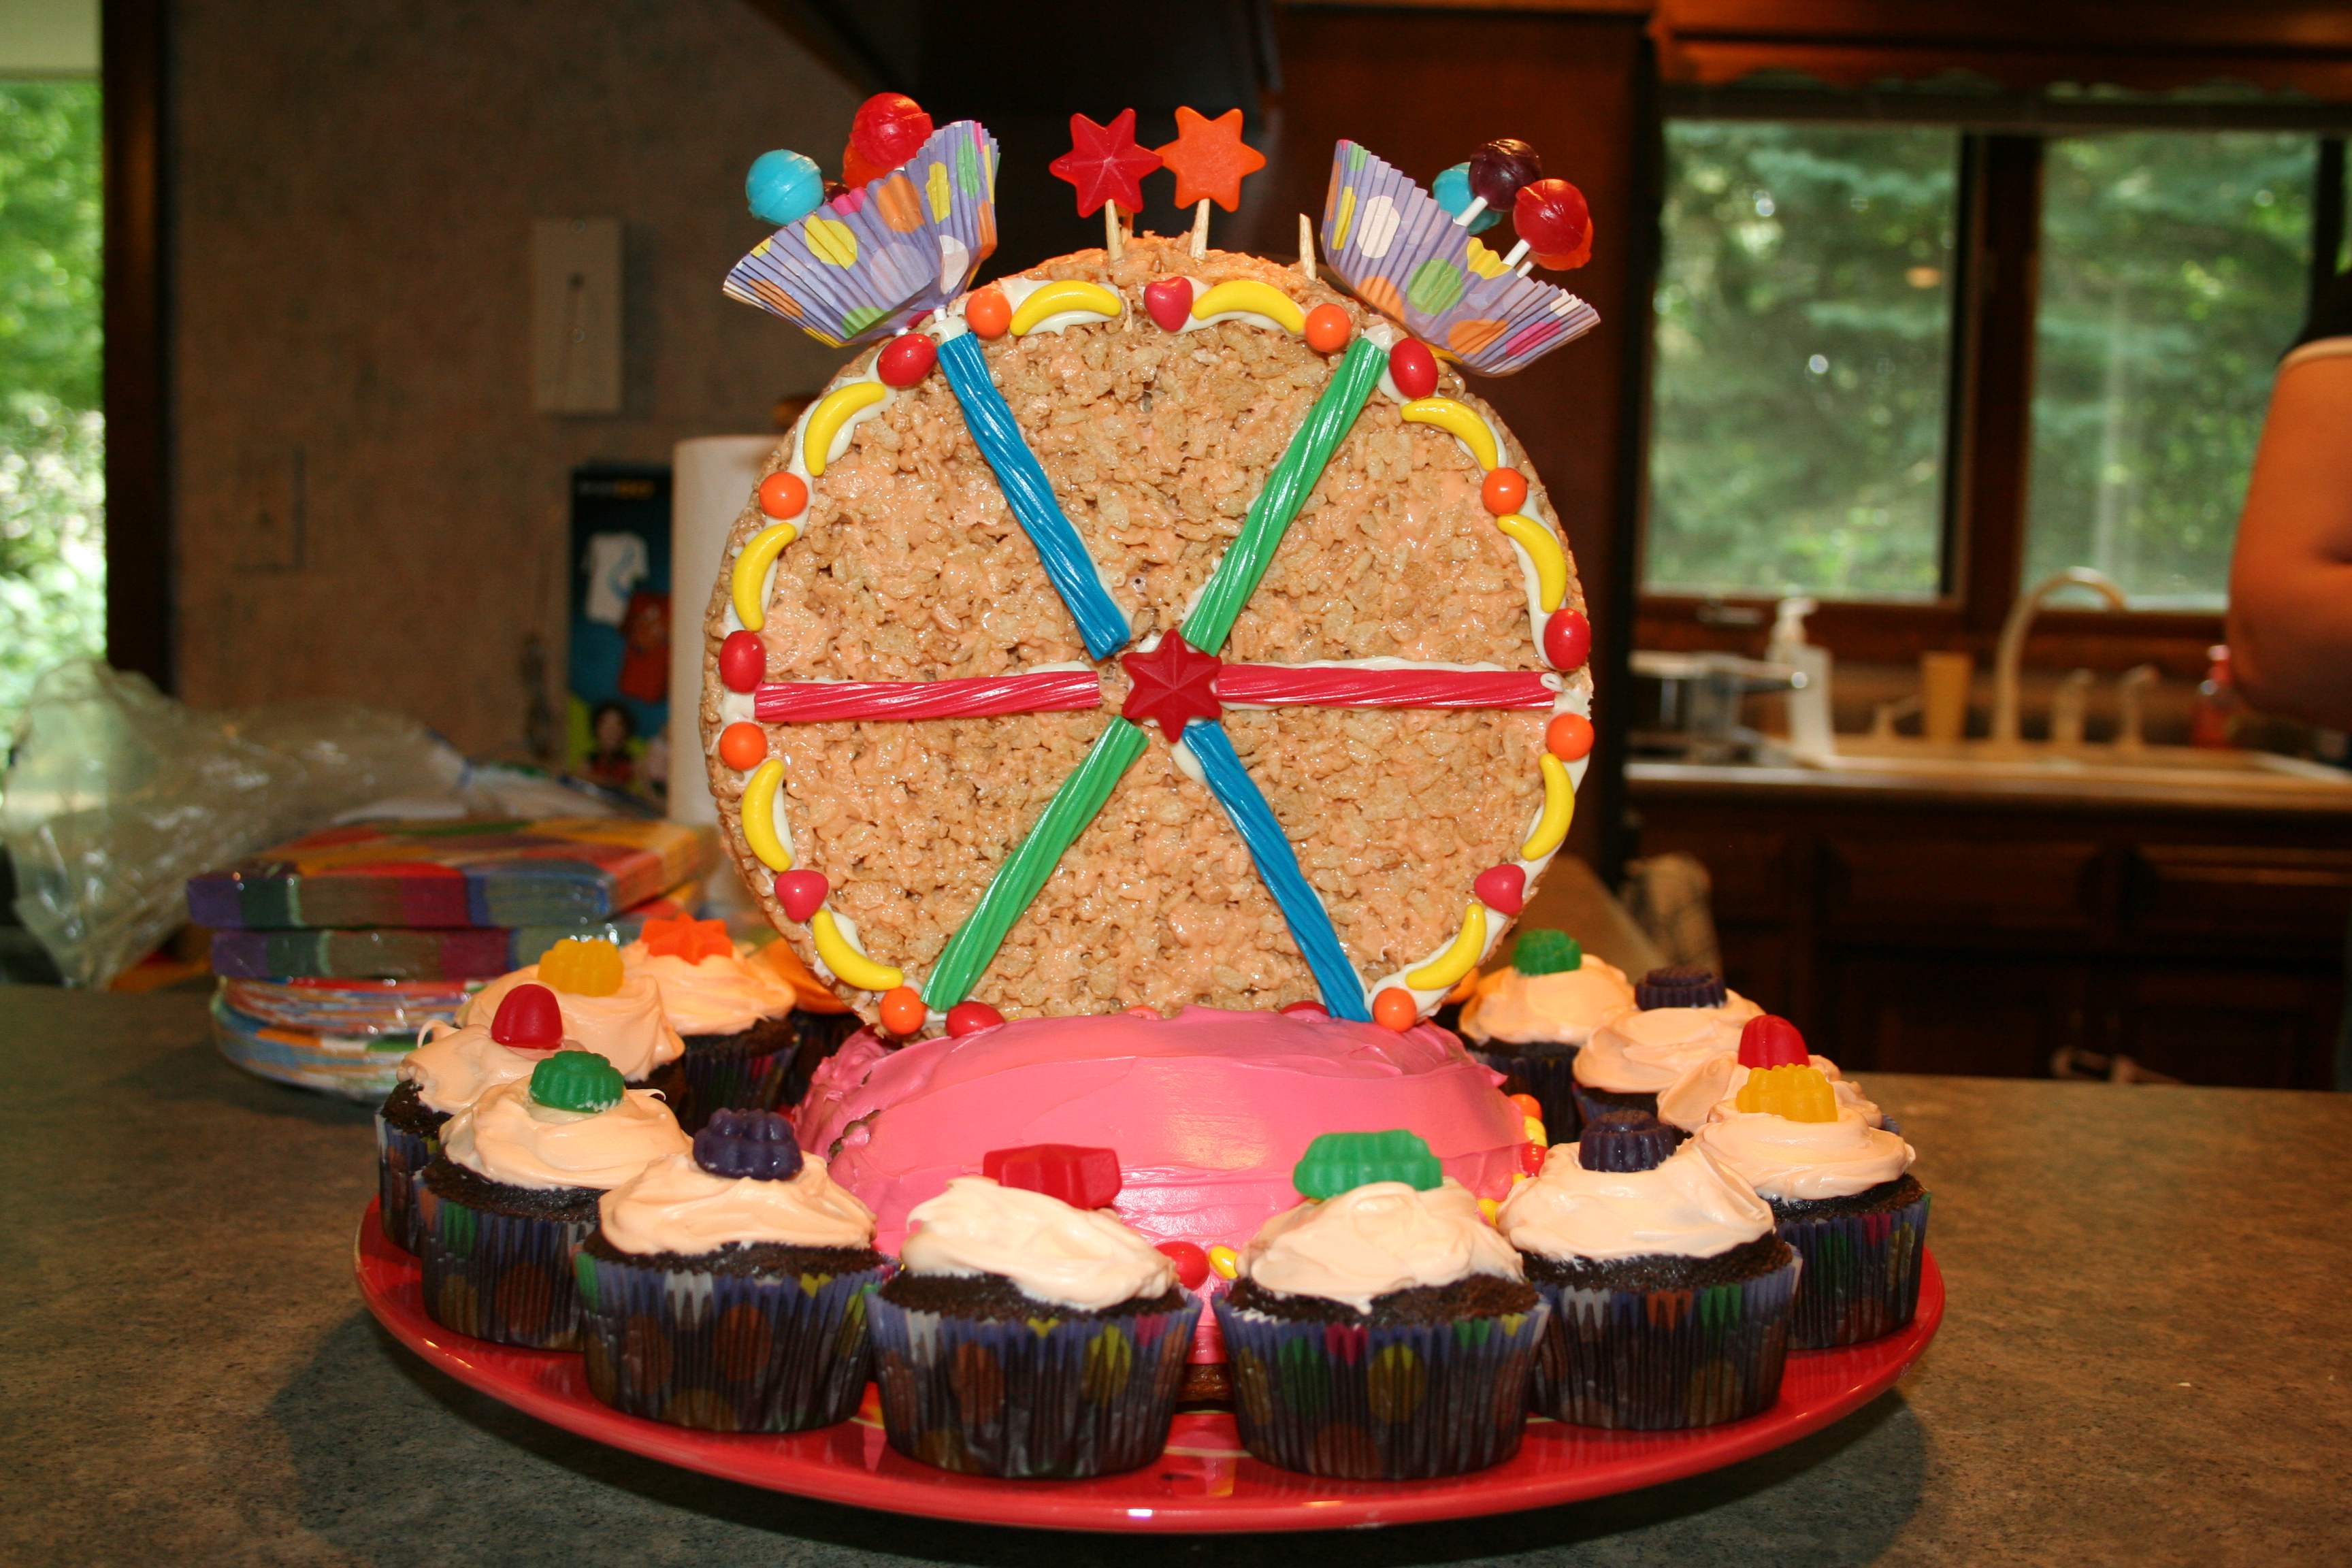 Cake Design Carnival Dmost for